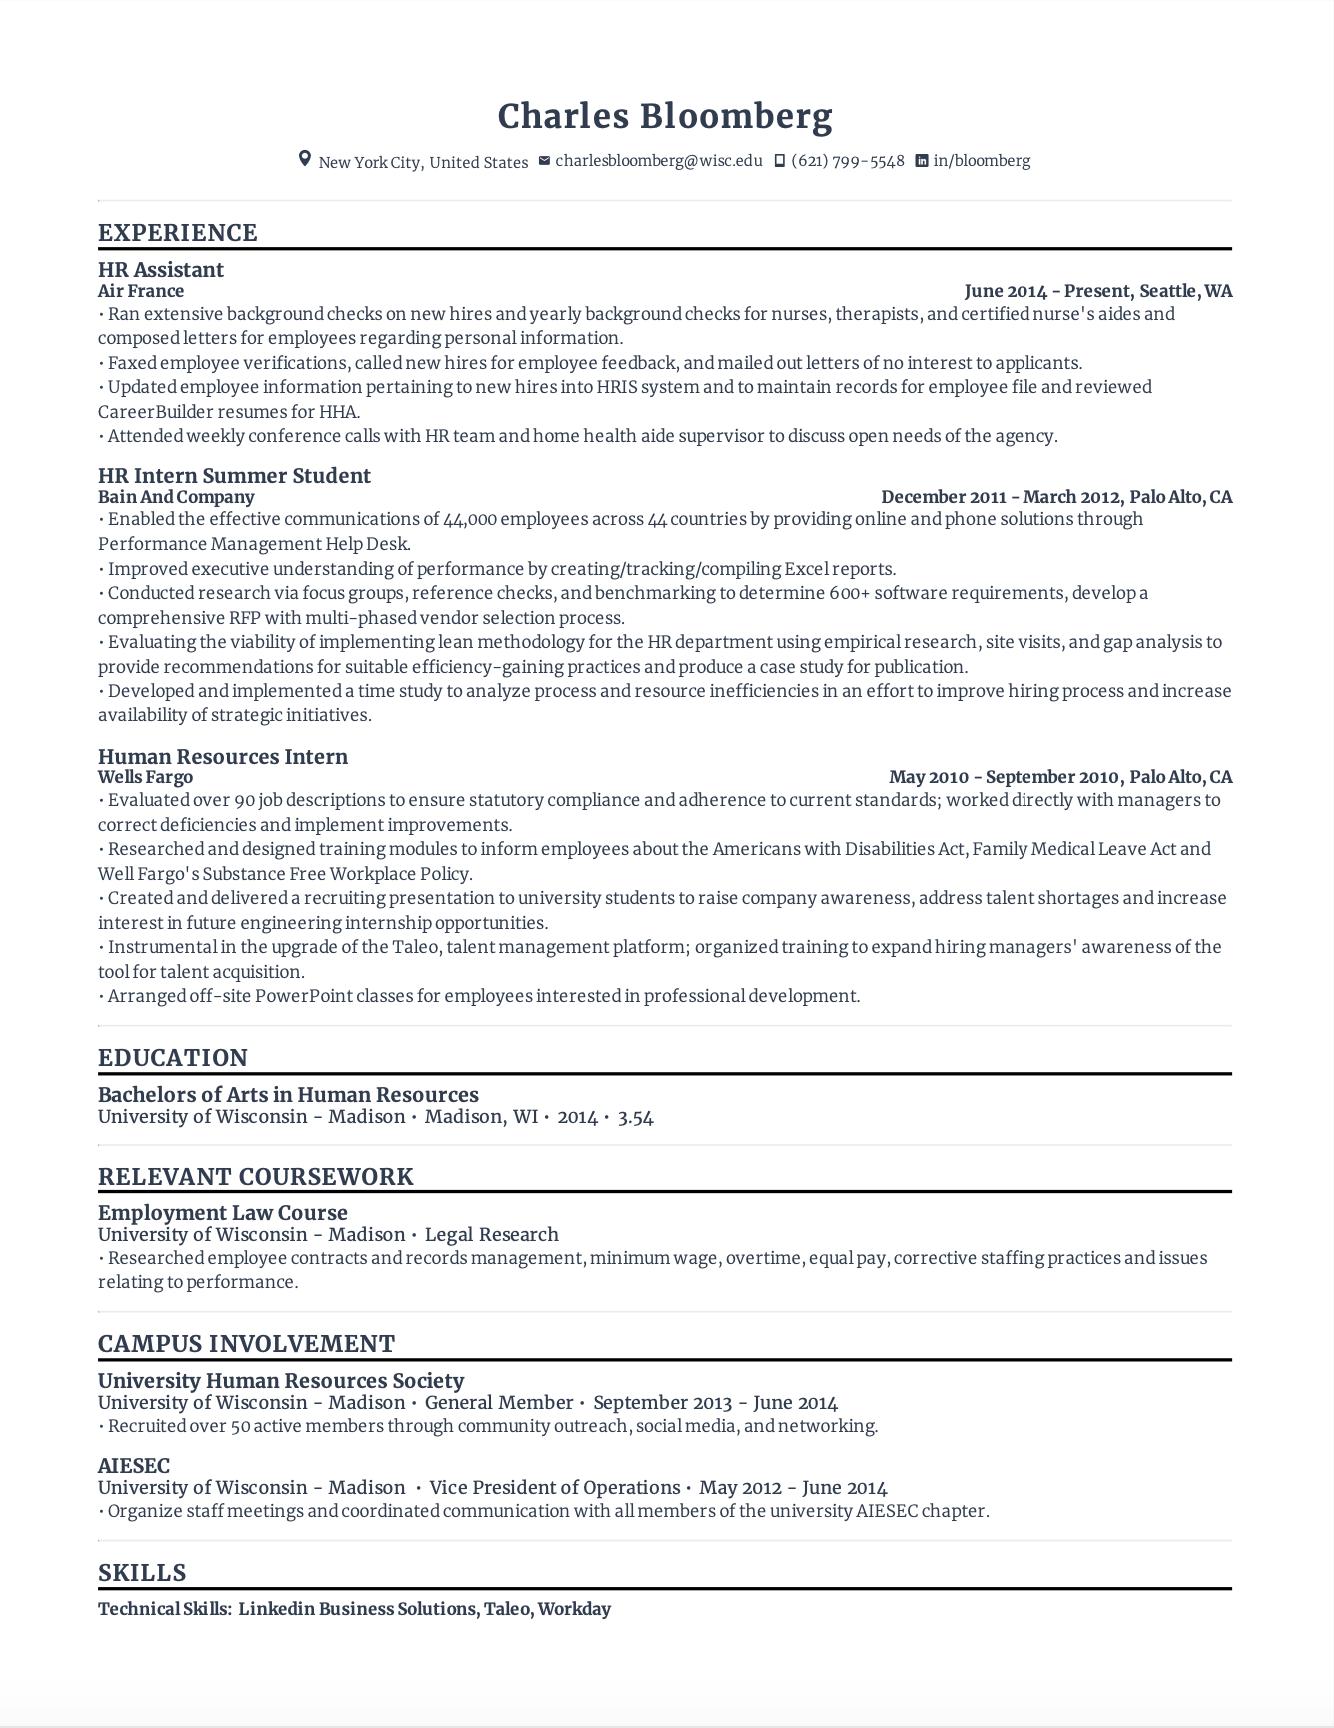 HR Resume Template